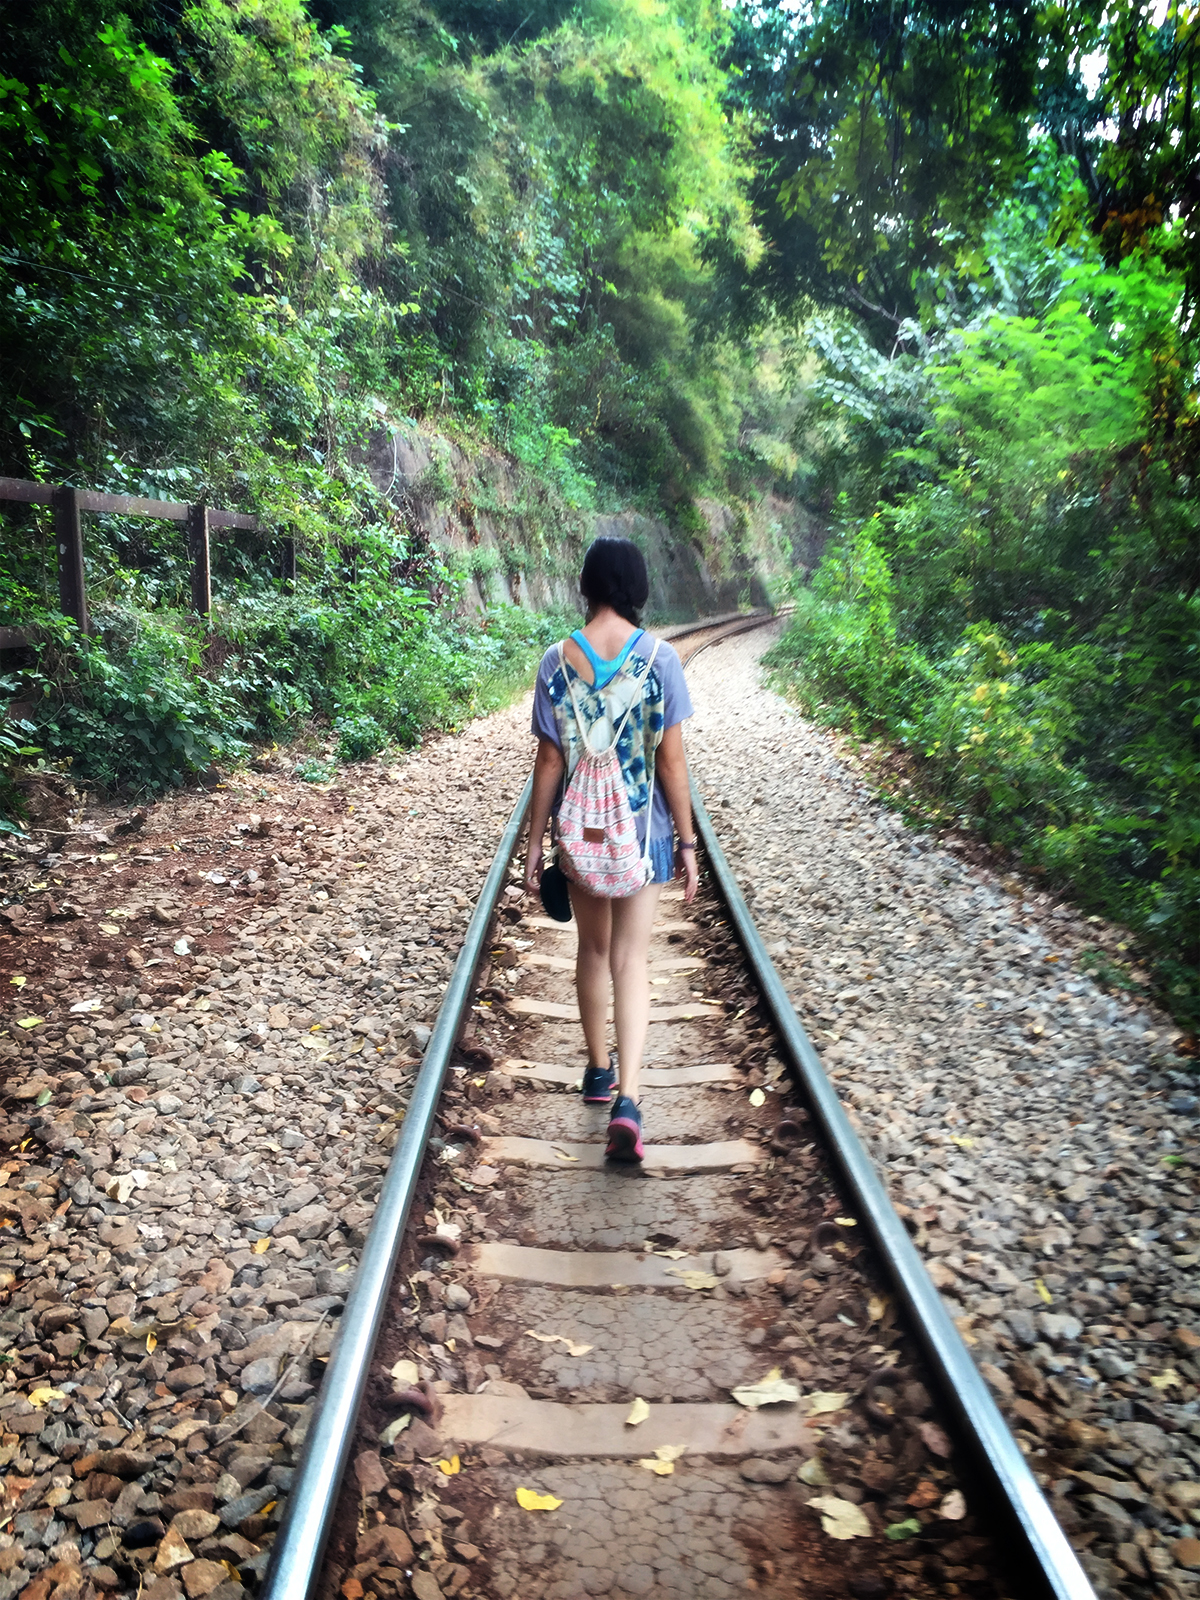 Stefanie walking down the train tracks.